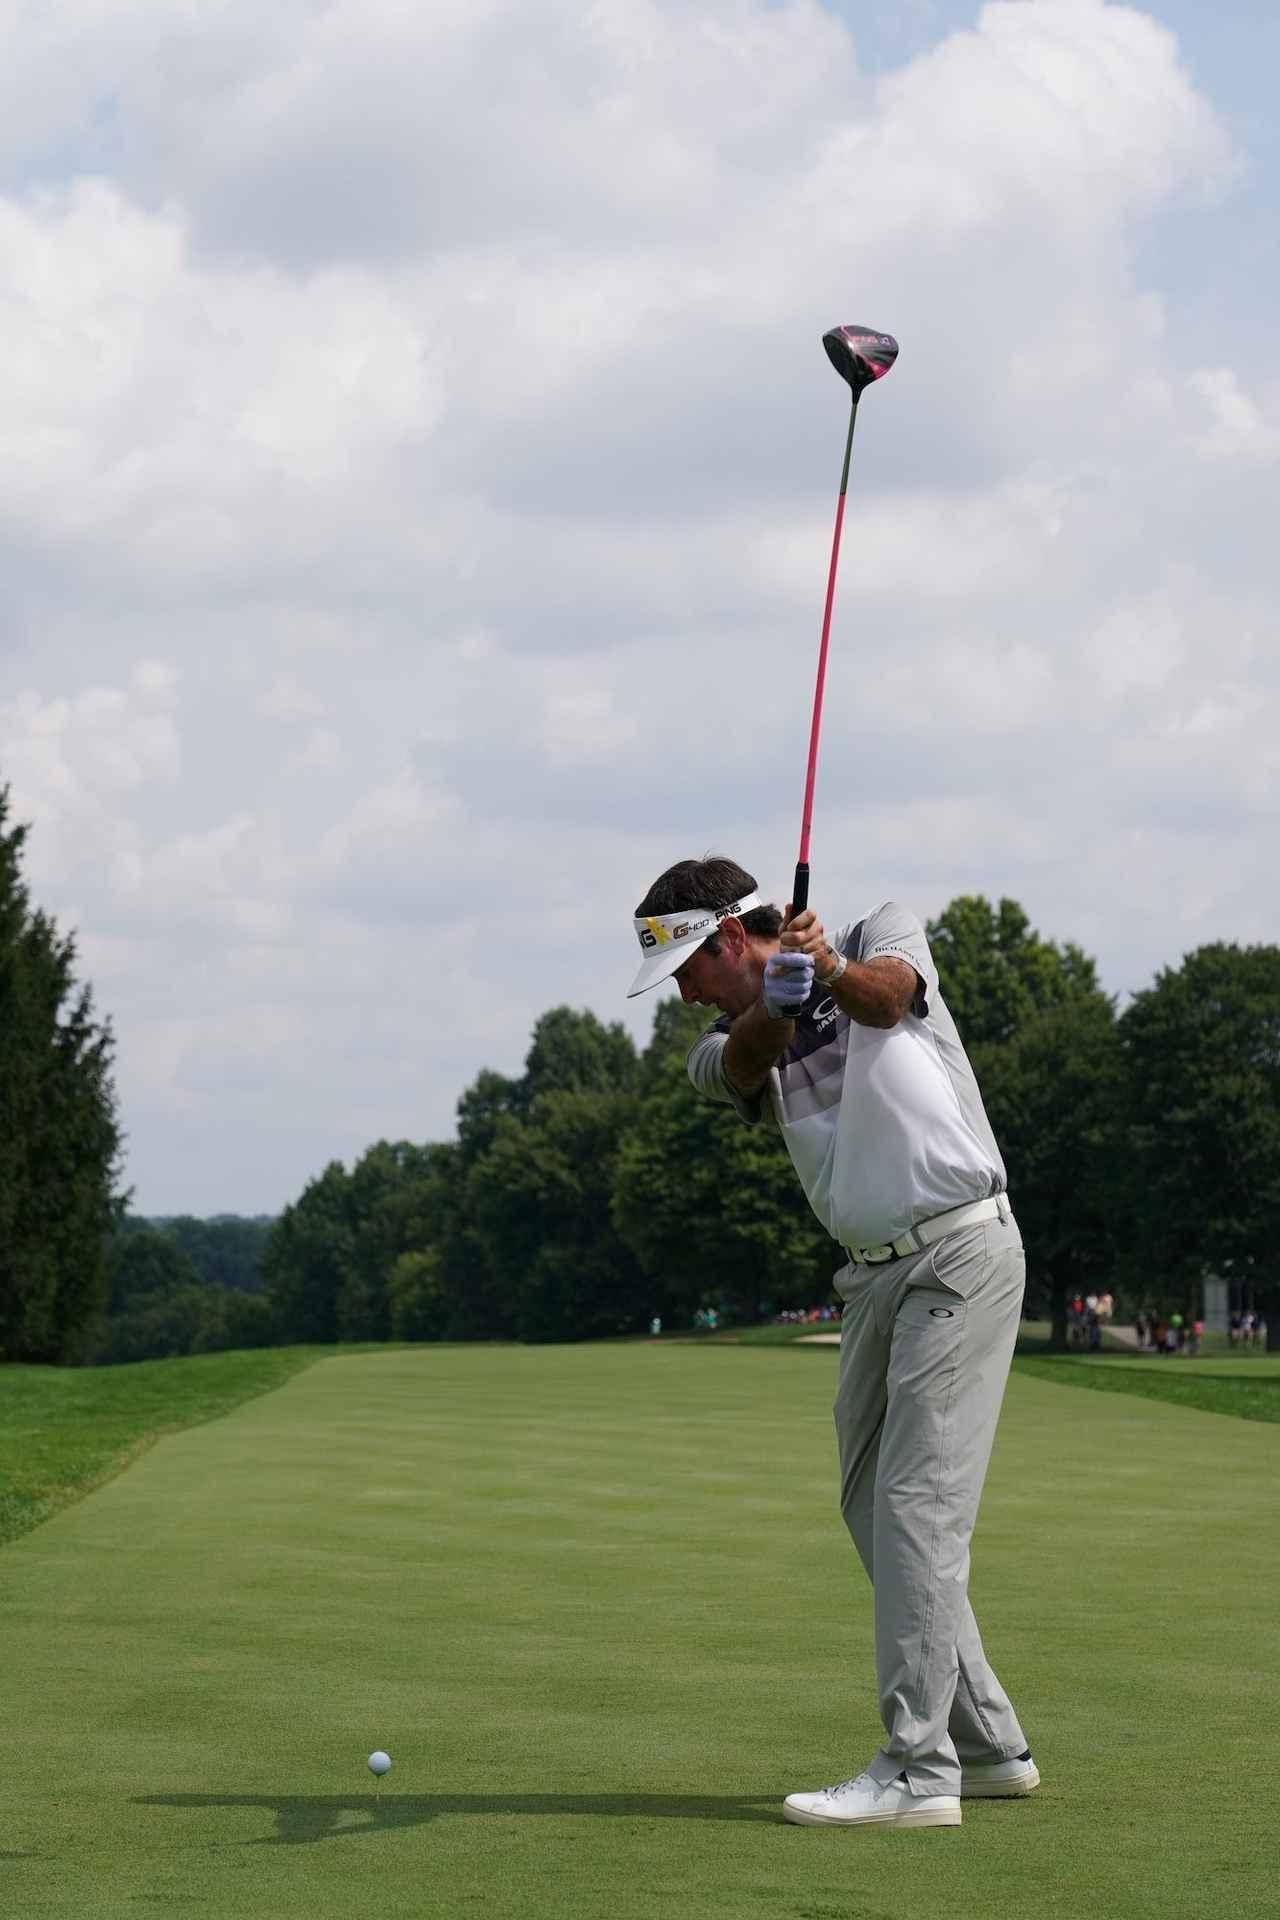 Images : 5番目の画像 - 強烈! バッバ・ワトソンのドライバーショット - みんなのゴルフダイジェスト